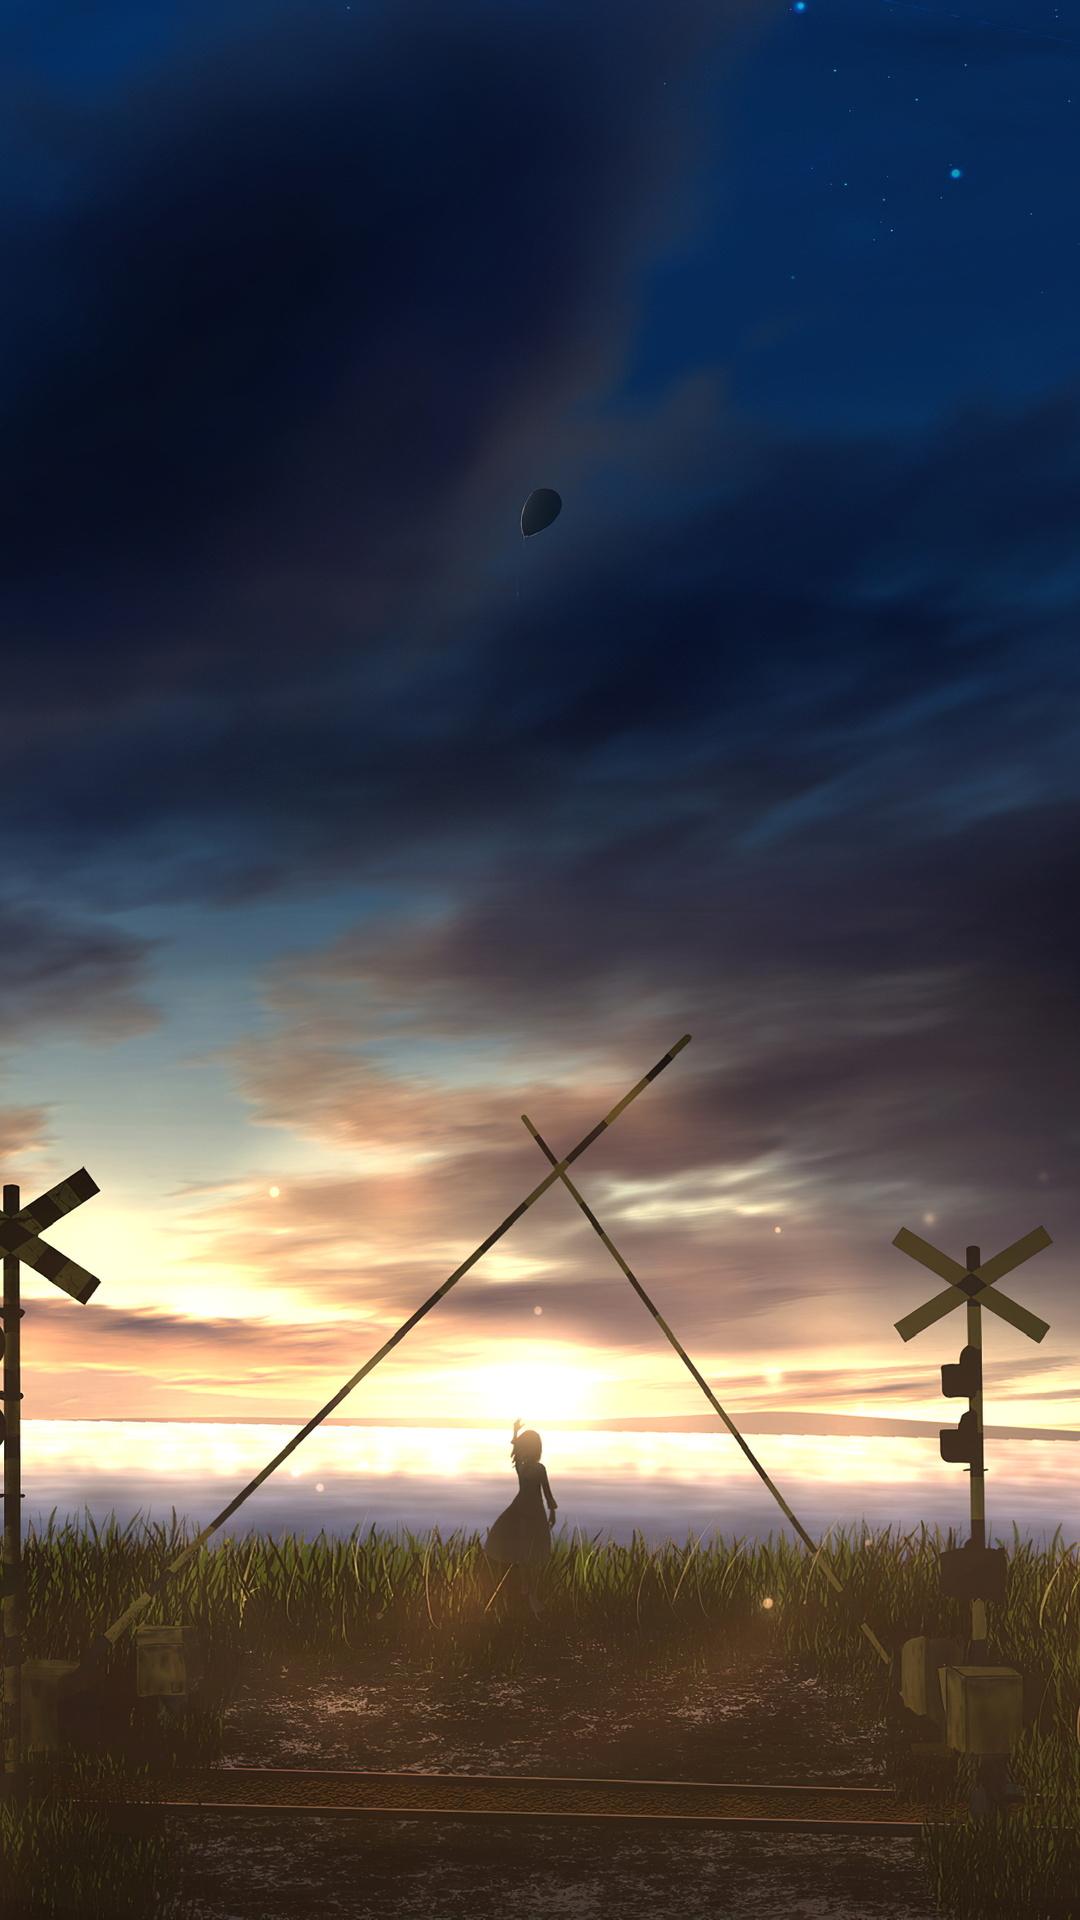 anime-girl-scenery-train-4k-j8.jpg